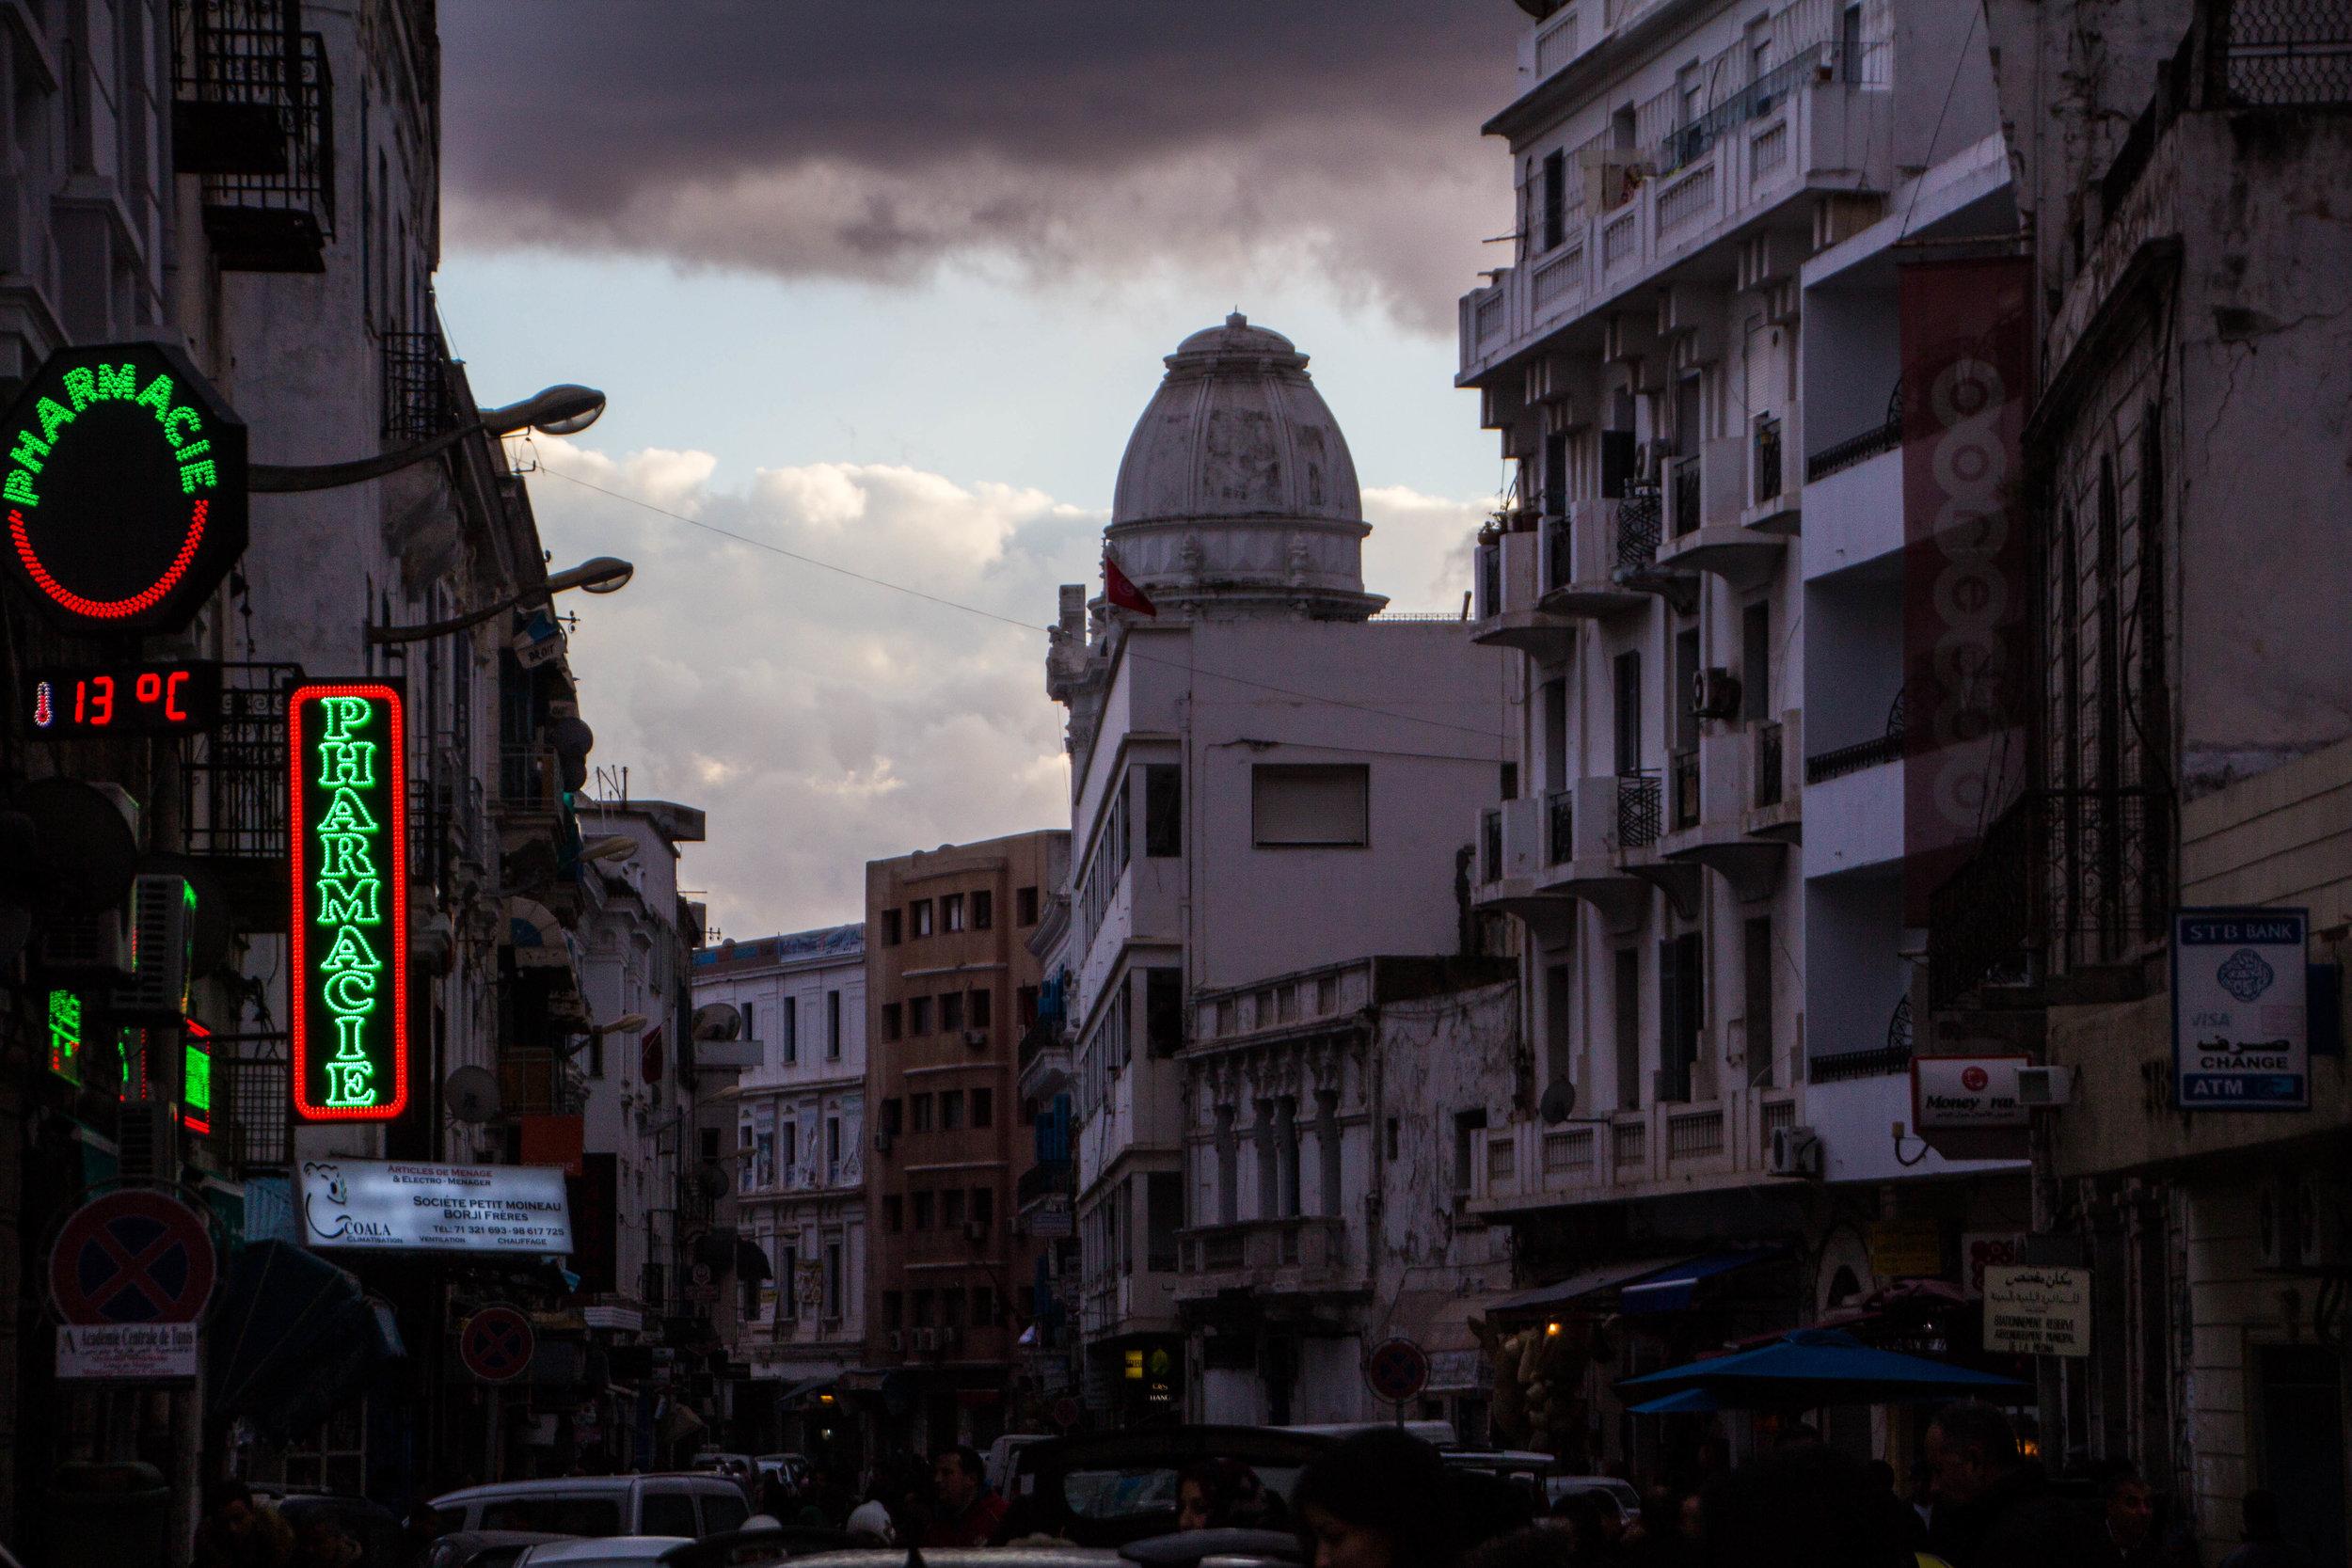 medina-photography-tunis-tunisia-65.jpg